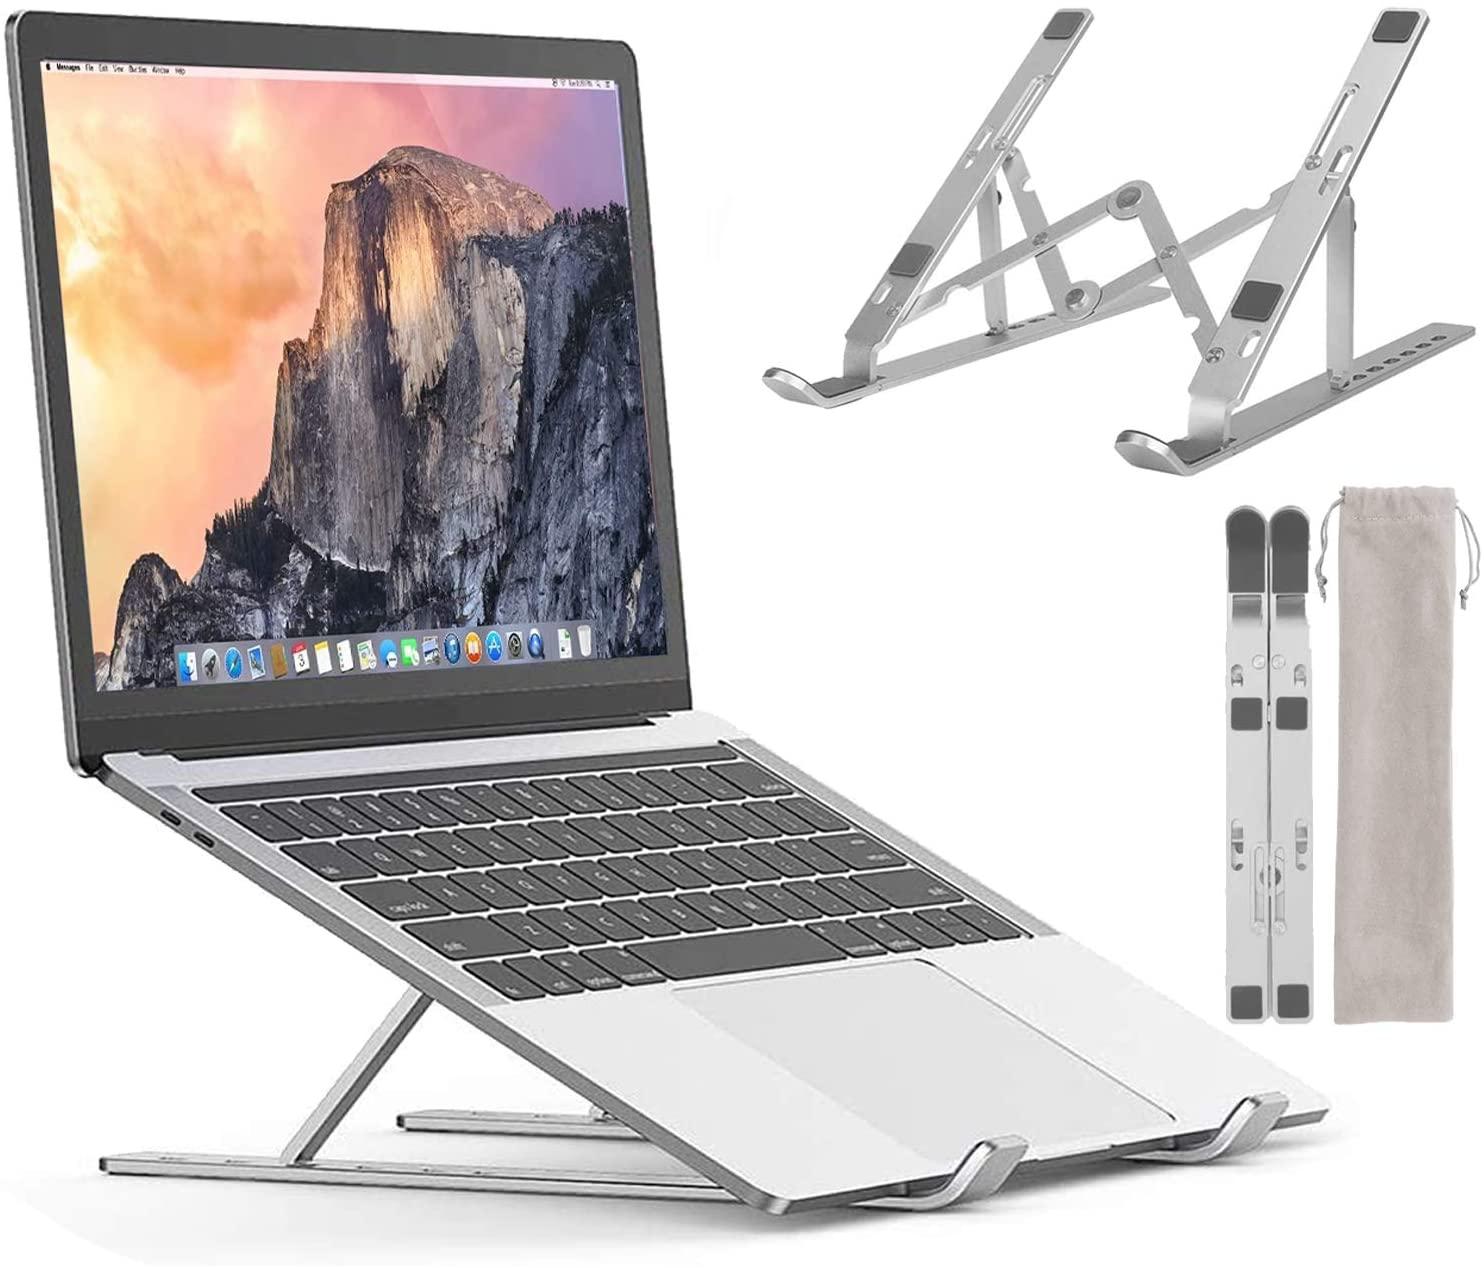 "Laptop Stand for Desk, Portable Computer Stands, Aluminum Adjustable Desktop Holder Ergonomic Foldable Notebook Tablet Riser Compatible with MacBook, iPad, HP, Dell, Lenovo, More 10-15.6"" Laptops"